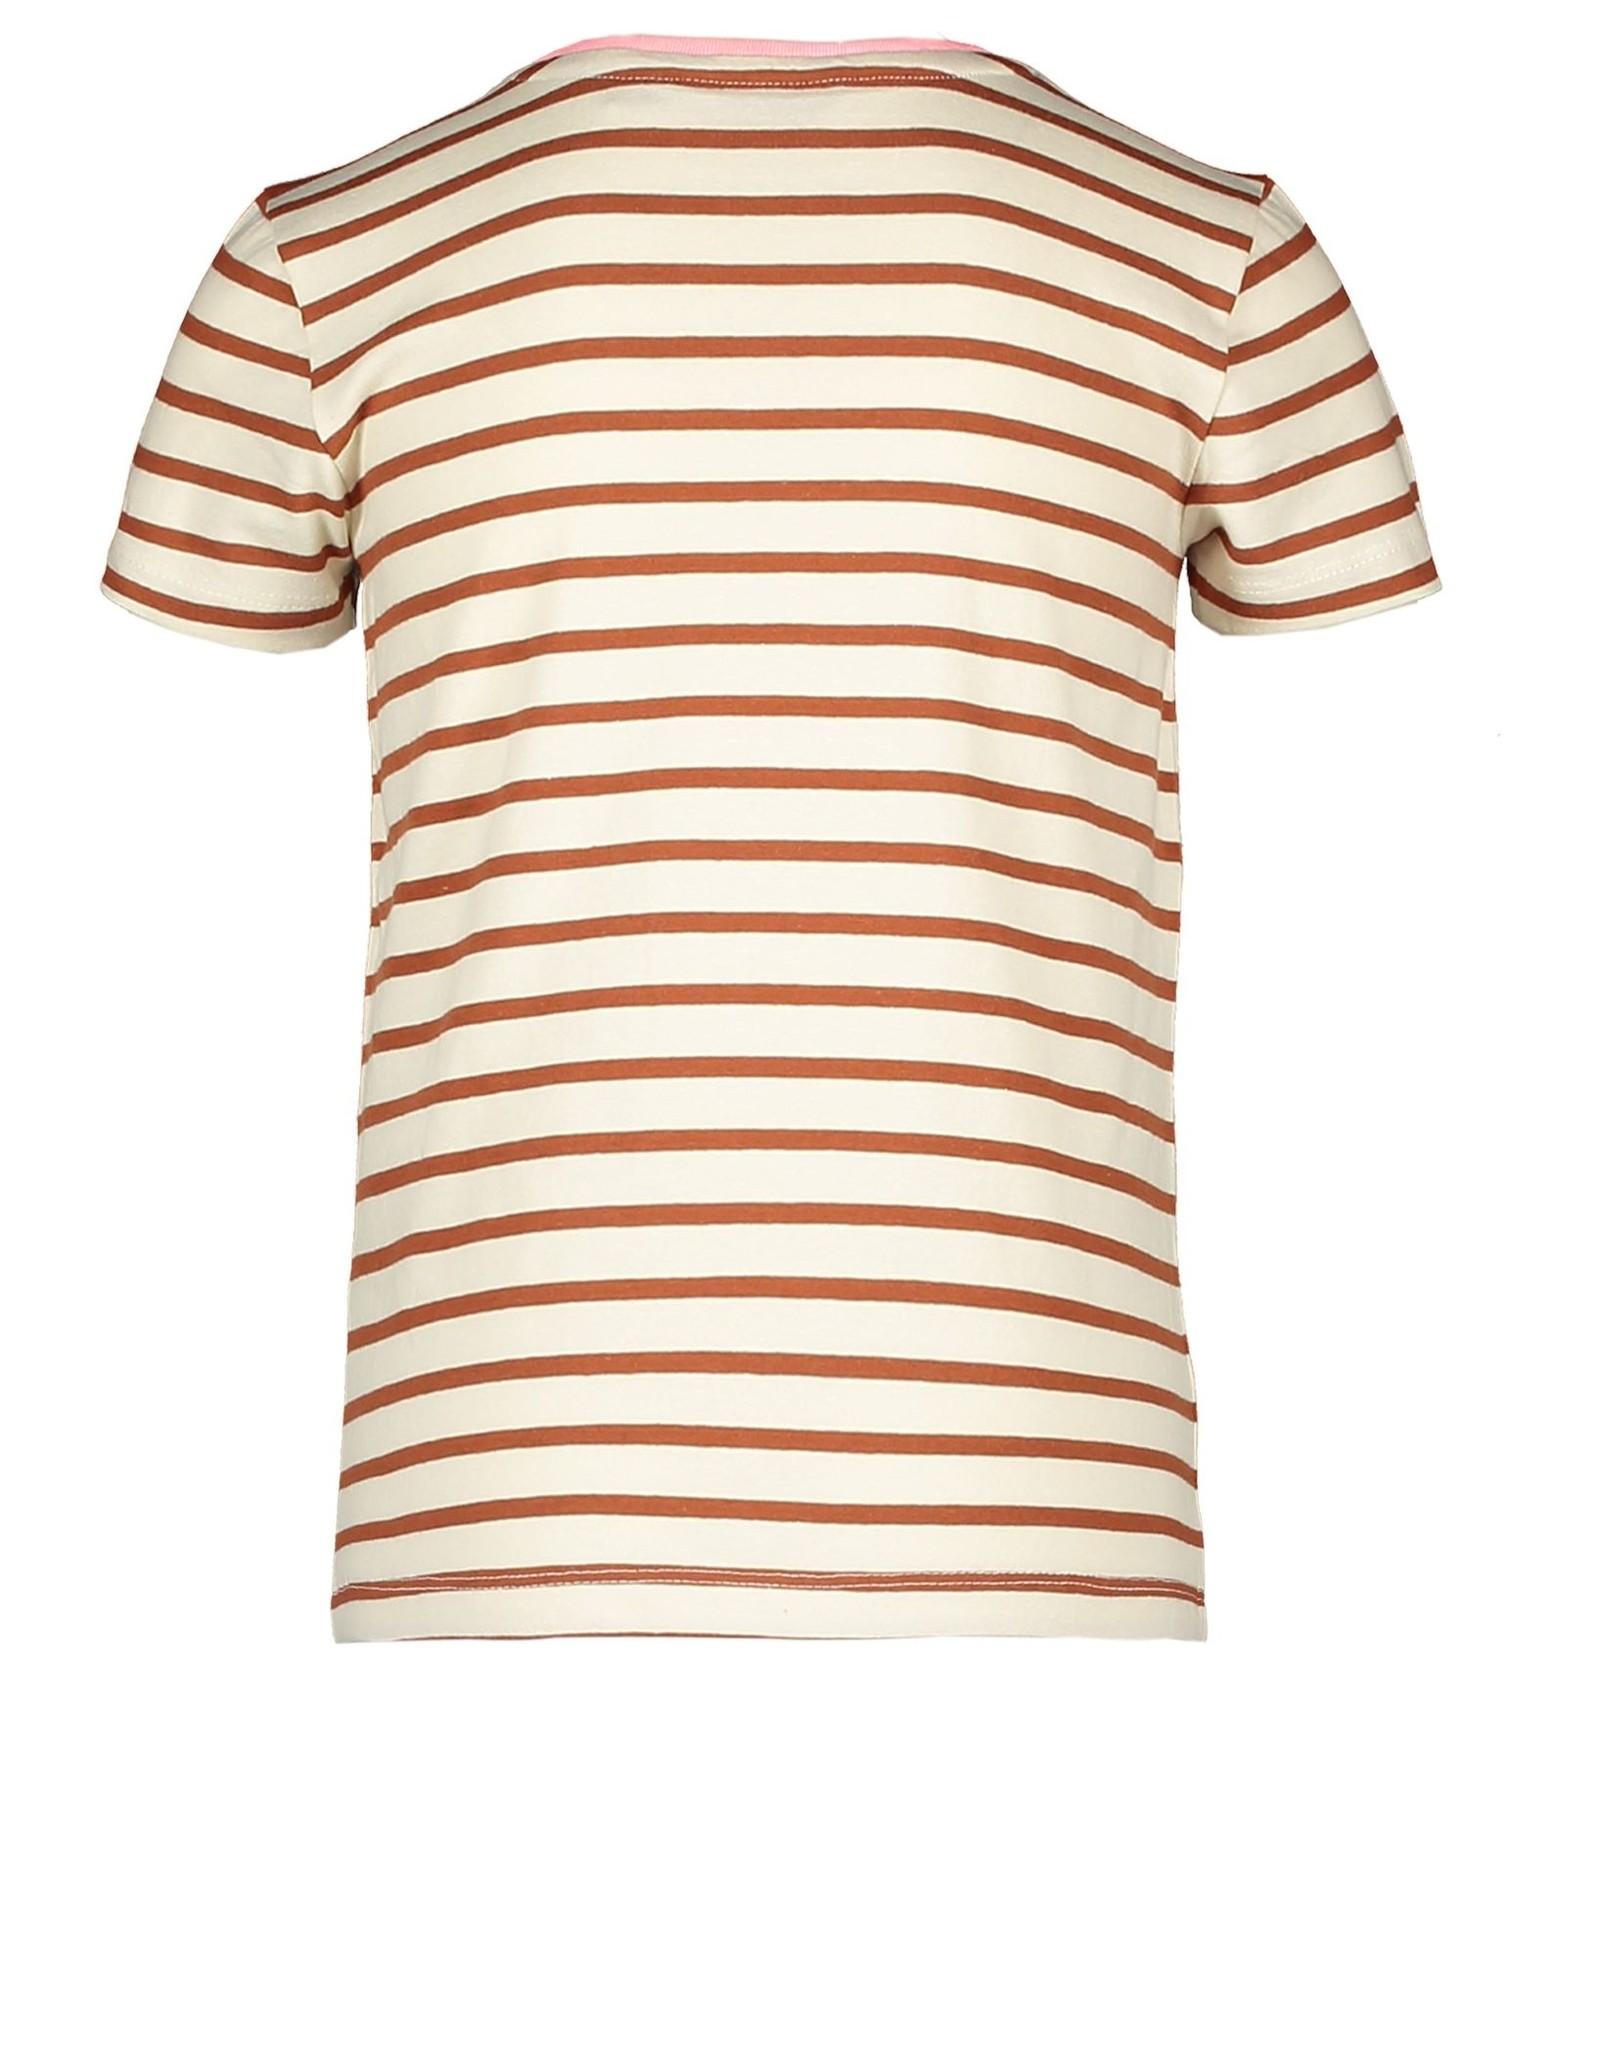 Moodstreet Moodstreet shirt 5404 toffee